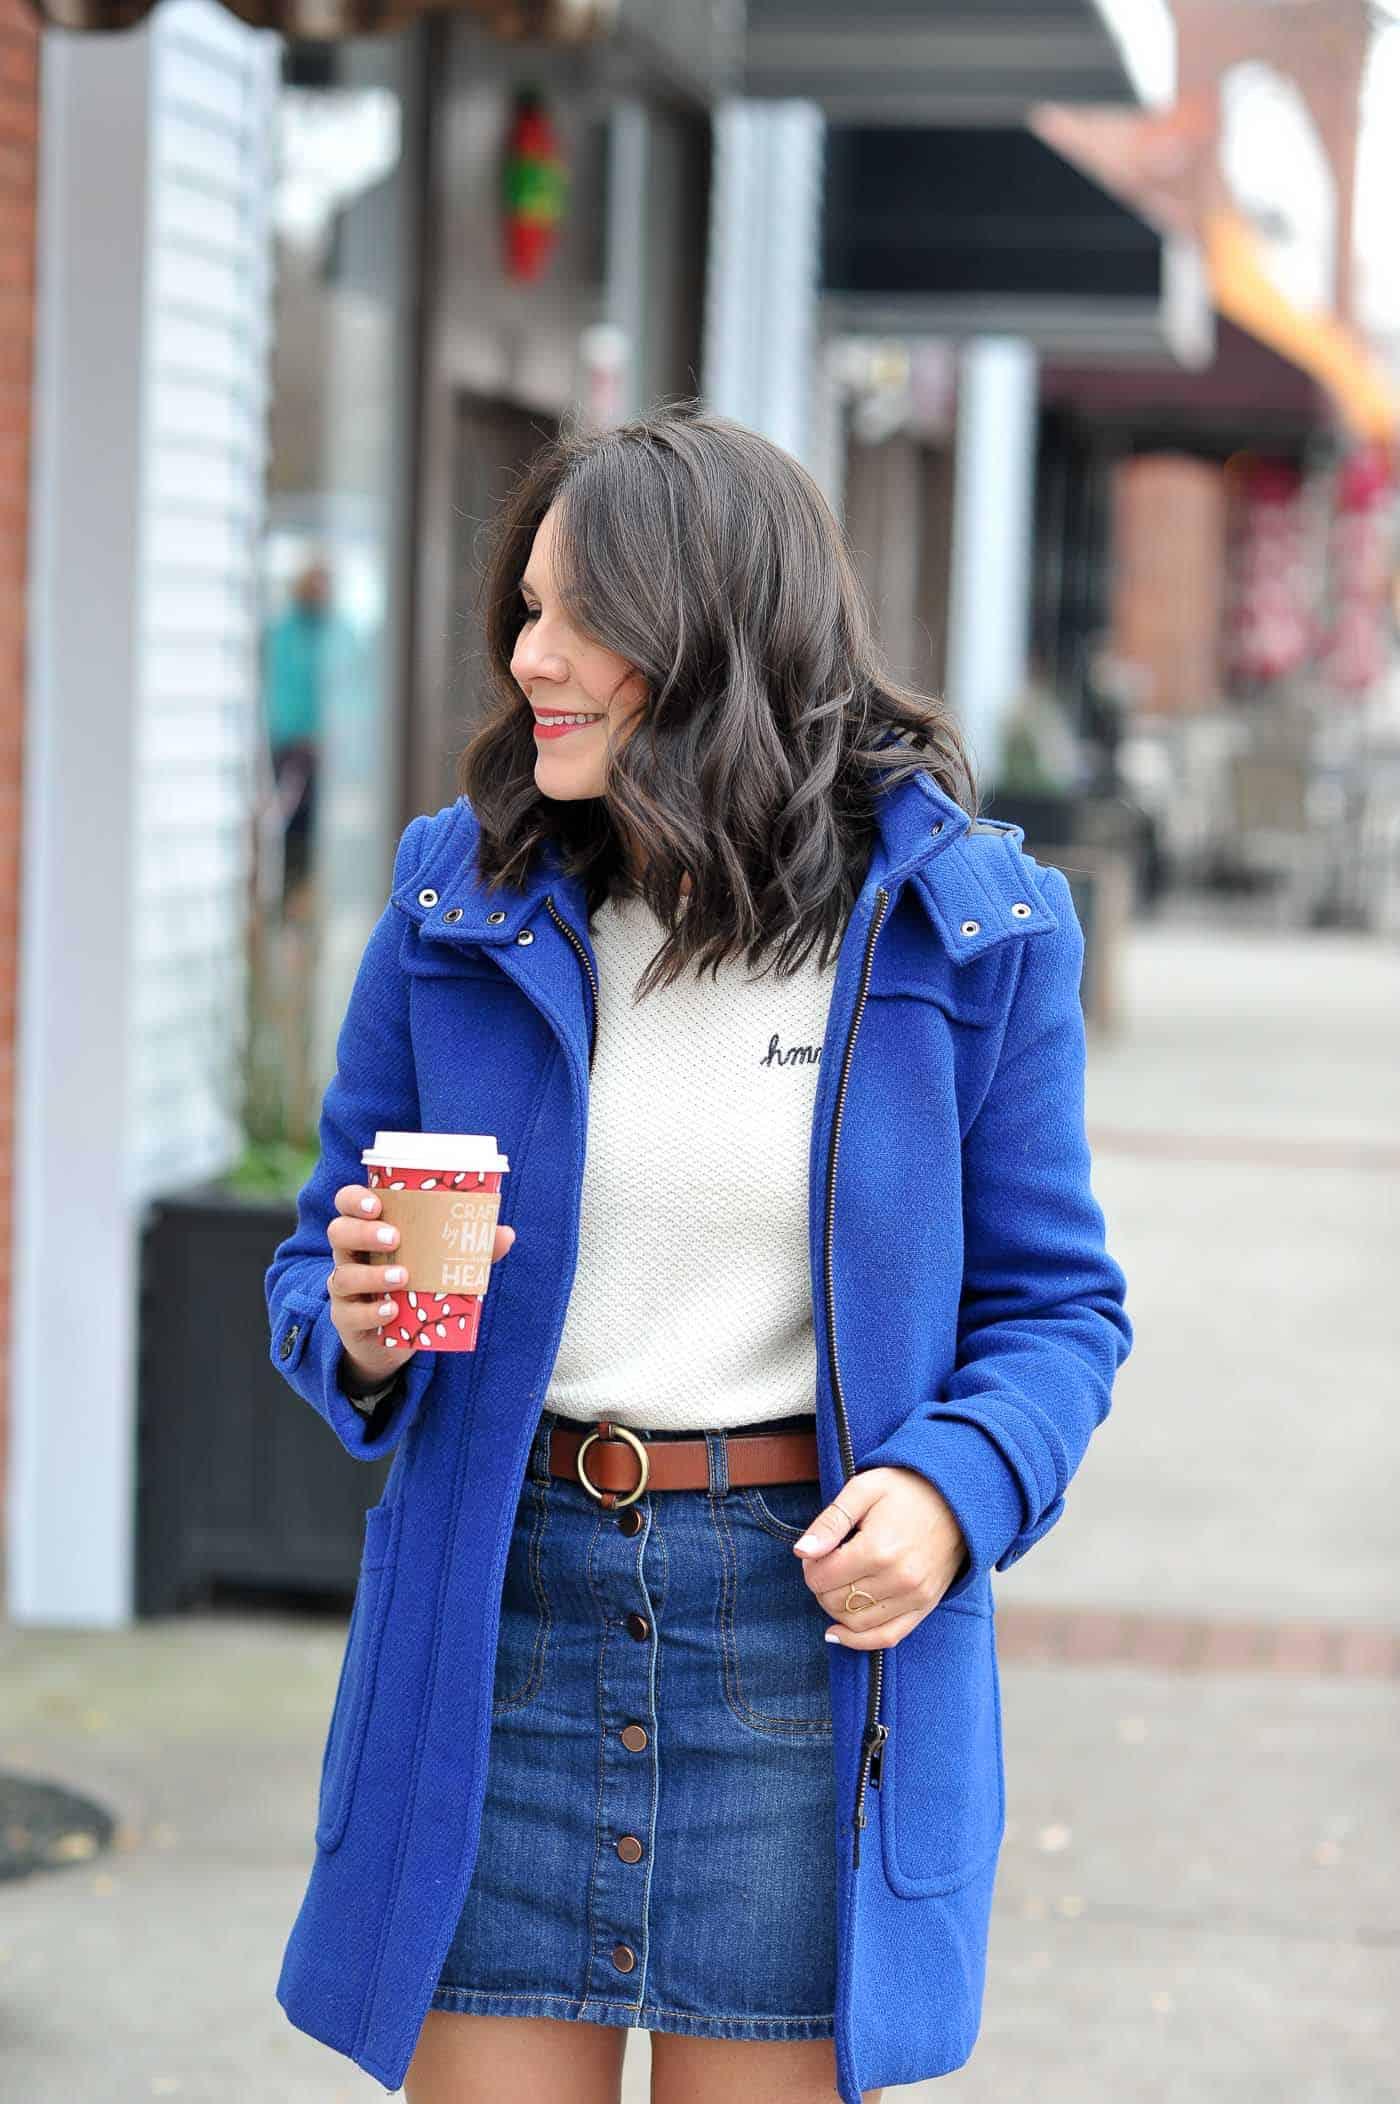 fall coats, winter coats, fall outfits  - My Style Vita @mystylevita